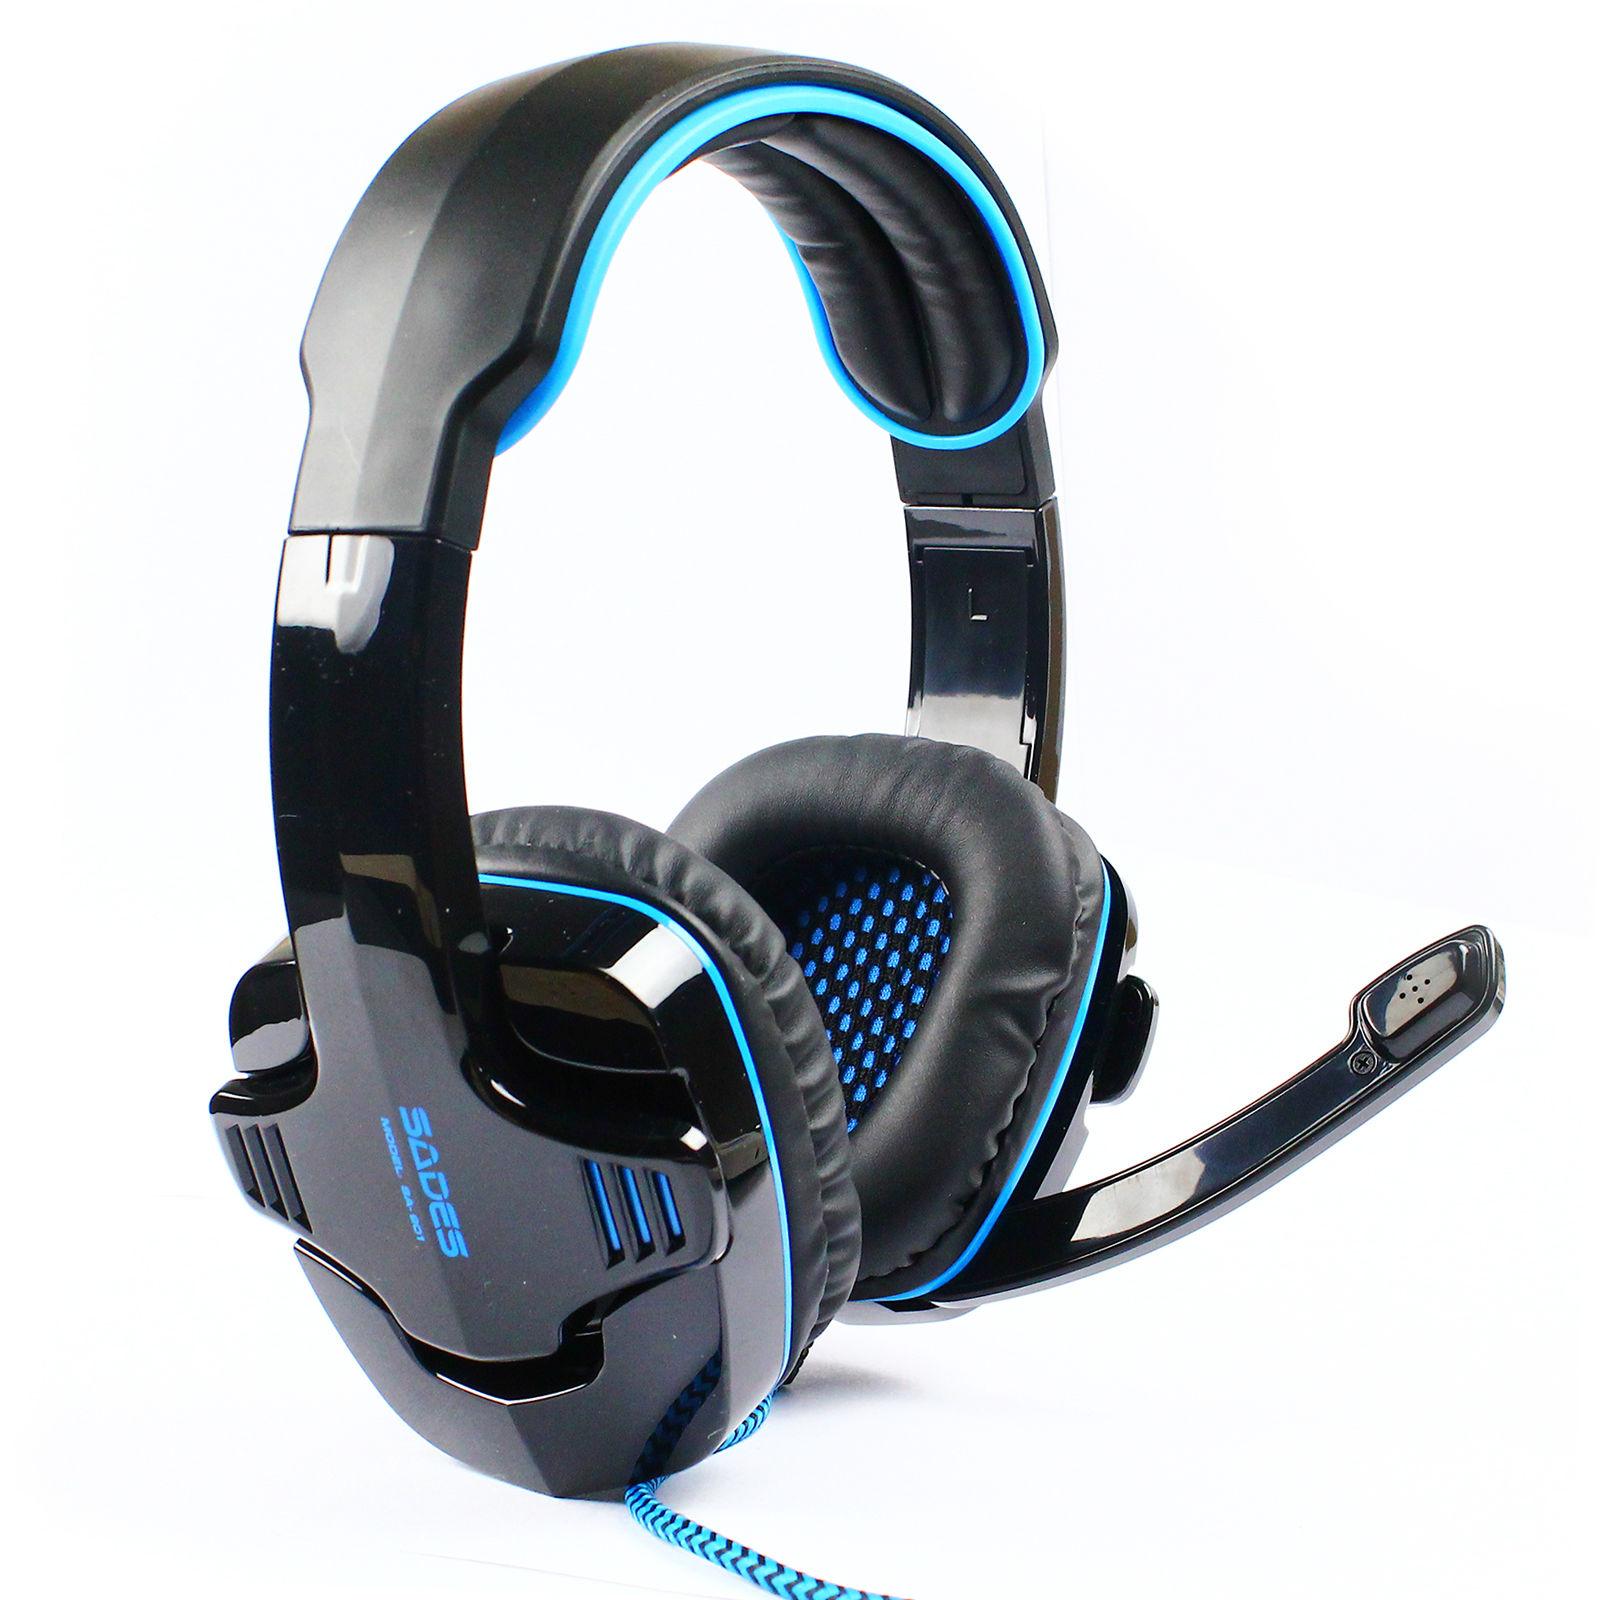 sades stereo 7 1 surround headset usb headband pc laptop pro gaming microphone. Black Bedroom Furniture Sets. Home Design Ideas